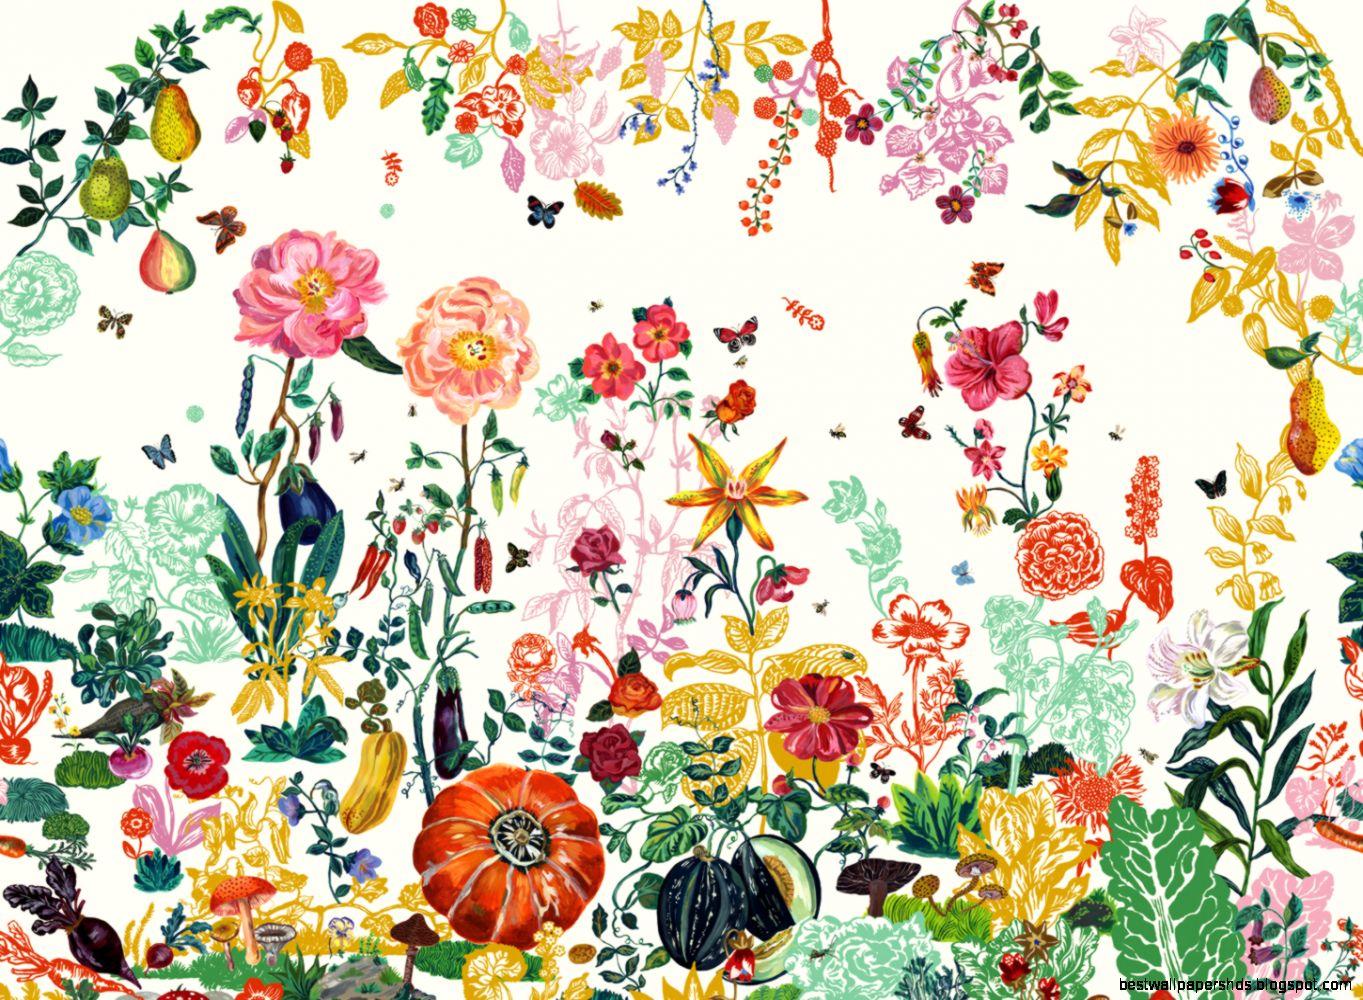 Fl Pattern Wallpaper by Justin Bruno on FL  Flowers HDQ  154 MB